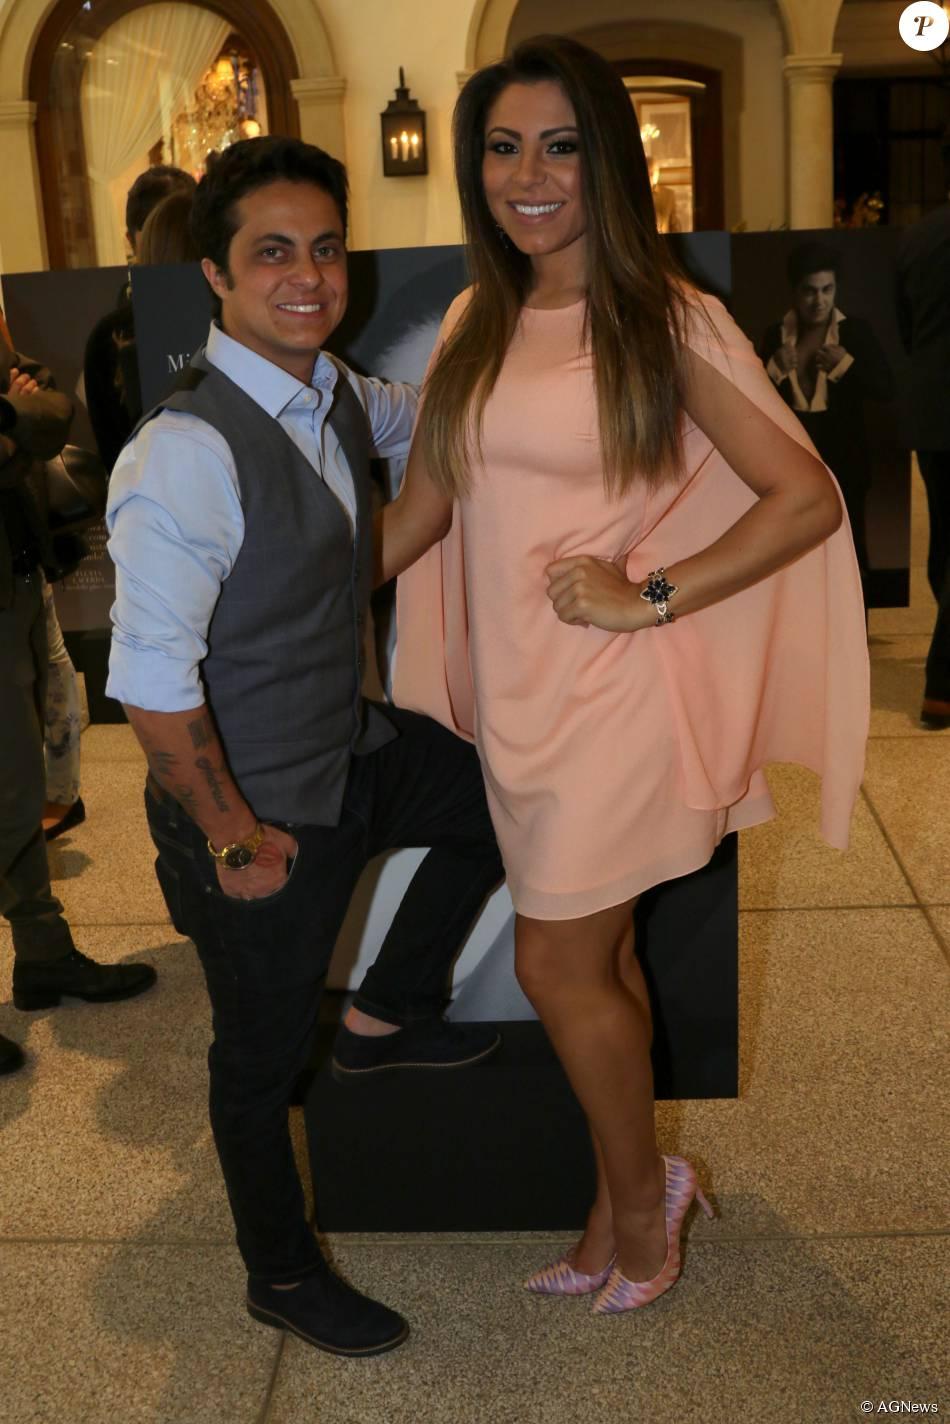 Ao lado da namorada, Andressa Ferreira, Thammy Miranda mostra todo o seu estilo após retirada dos seios (agosto de 2015)